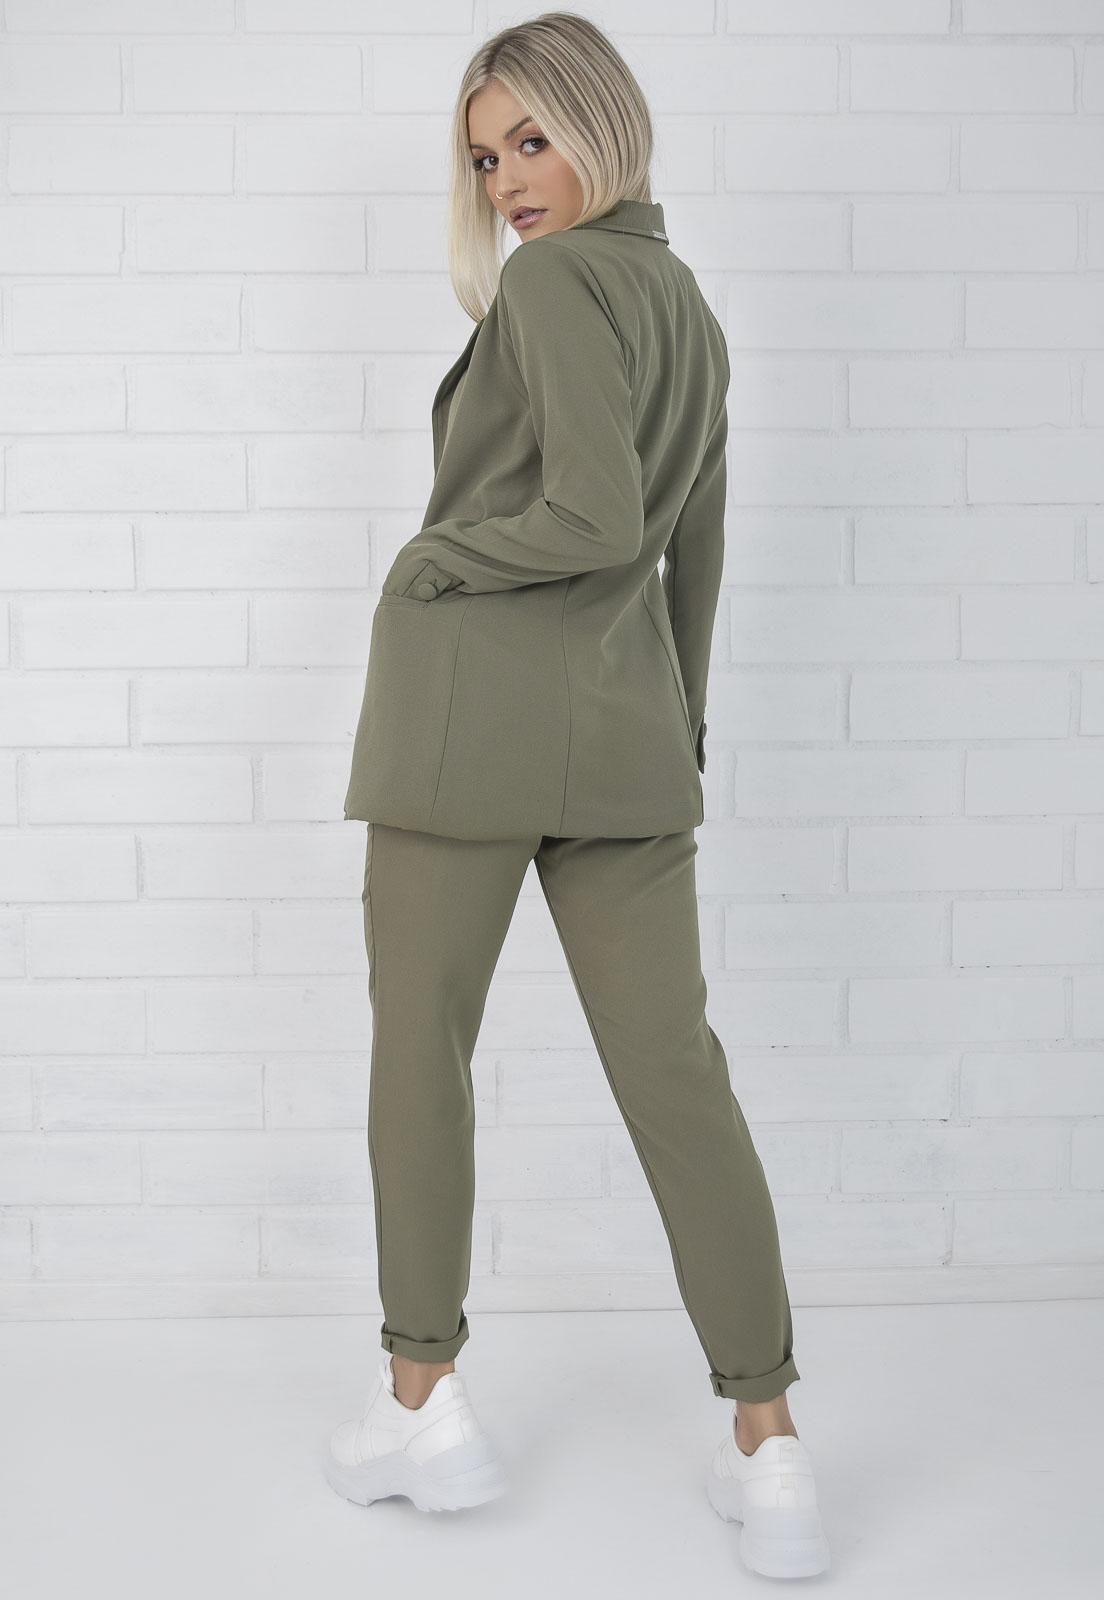 Blazer Feminino Alfaiataria Alongado Verde Militar Ciara Pkd